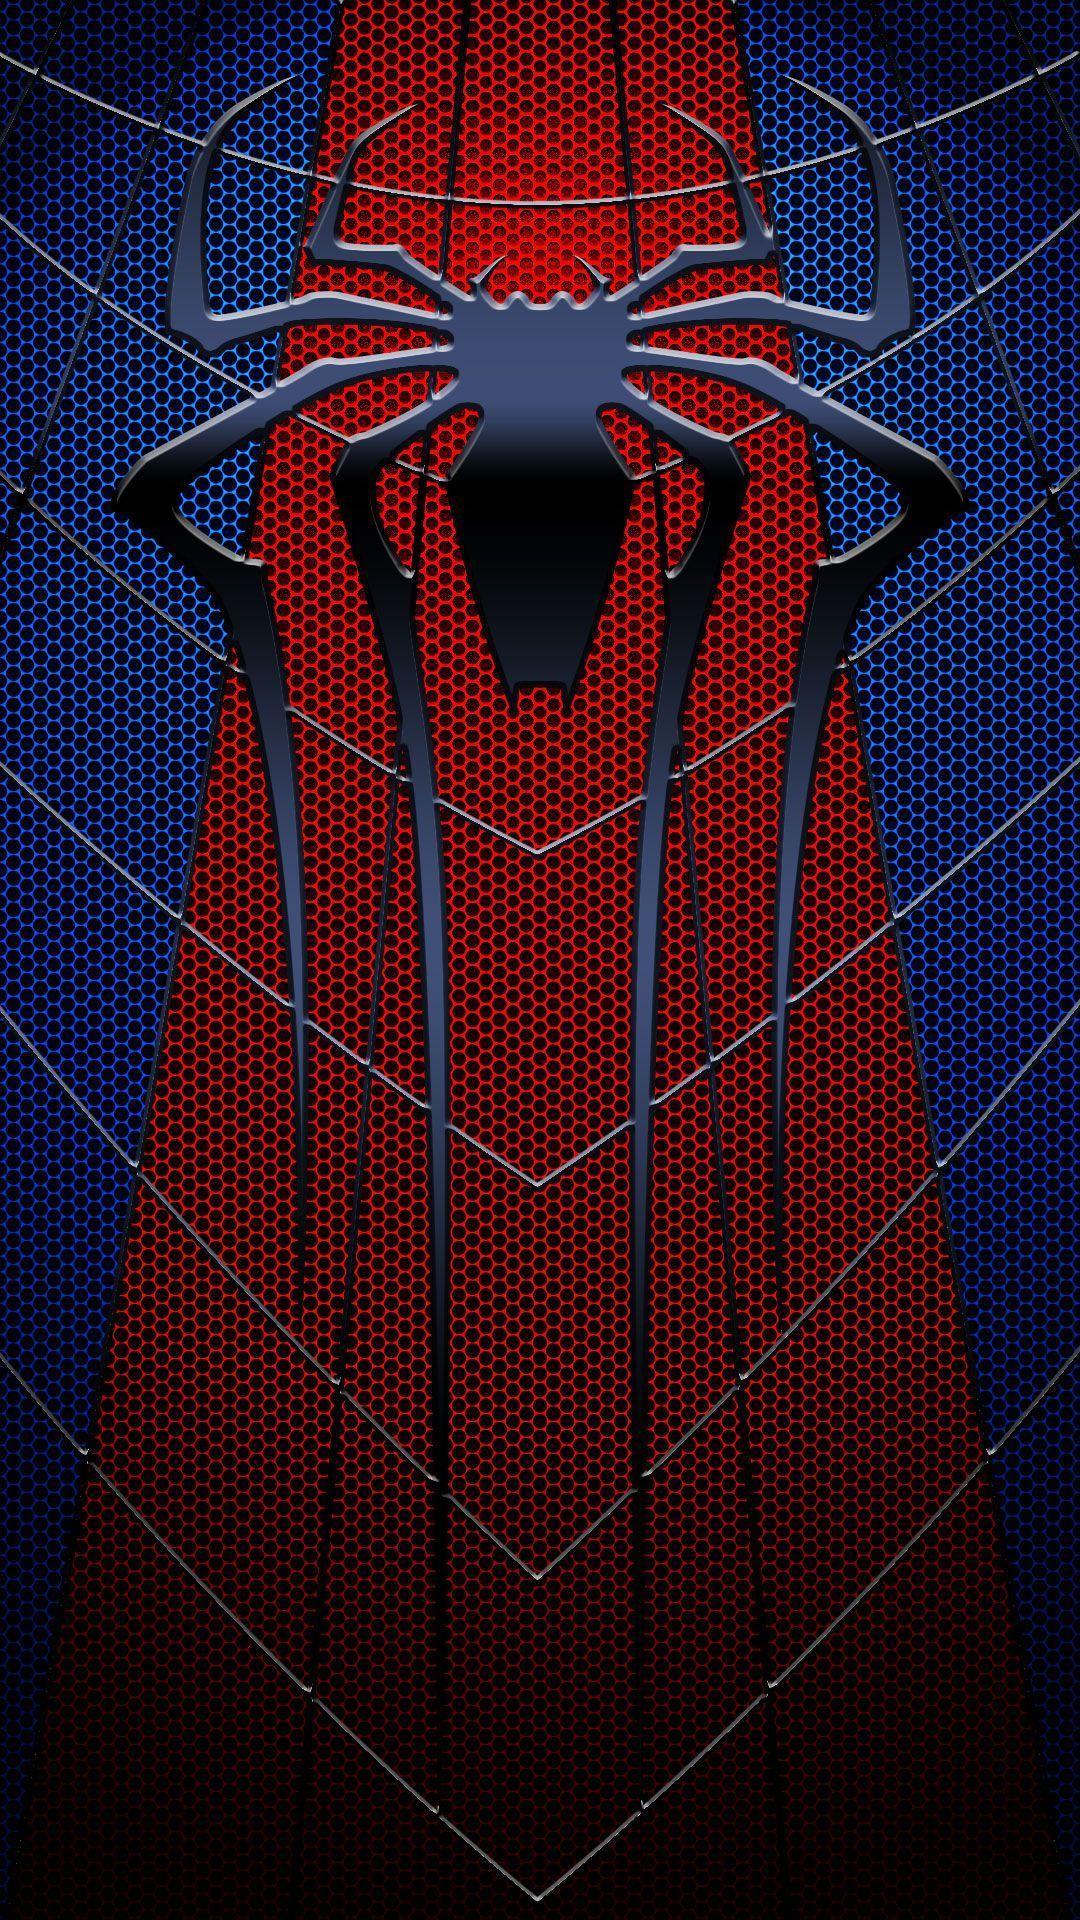 Spider Man 4k Mobile Phone Wallpapers - Wallpaper Cave